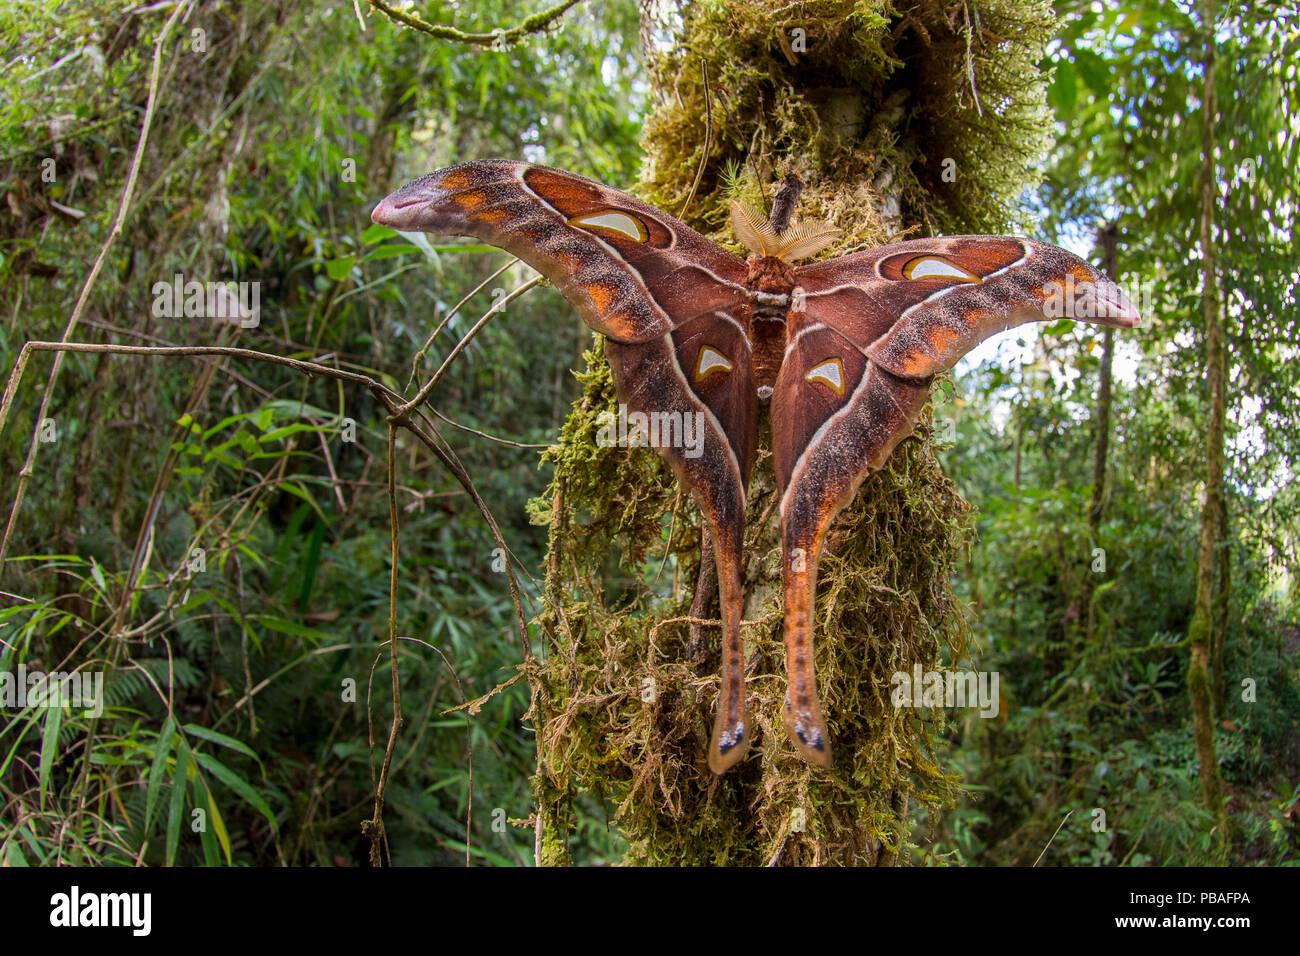 Herkules Motte (Coscinocera Hercules) entstanden erst kürzlich in Montanen rinforest. Ambua Lodge, Tari, Hela Provinz, Papua Neu Guinea. Juni Stockbild